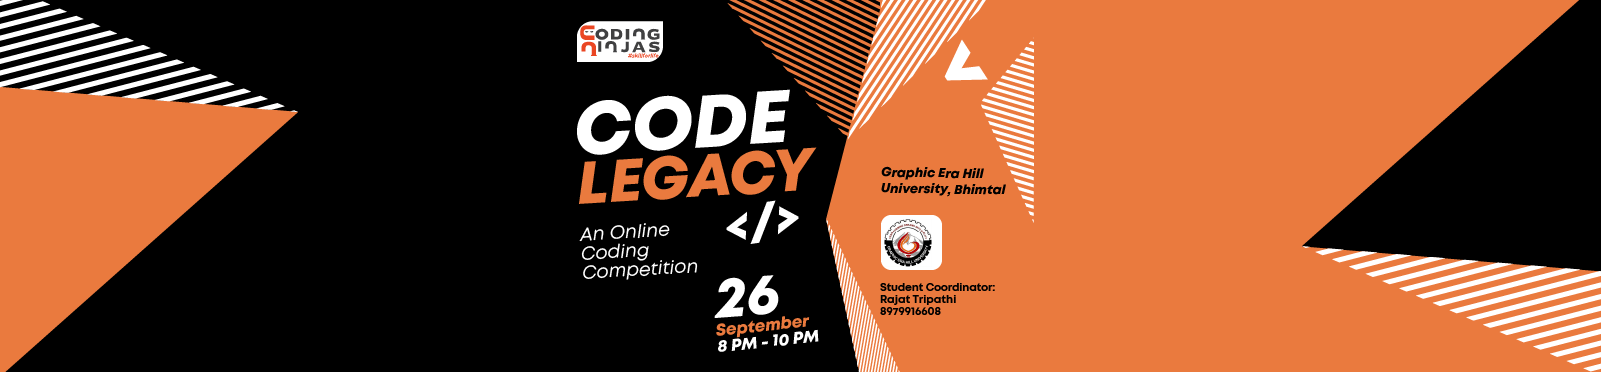 "Code Legacy at ""Graphic Era Hill University, Bhimtal """